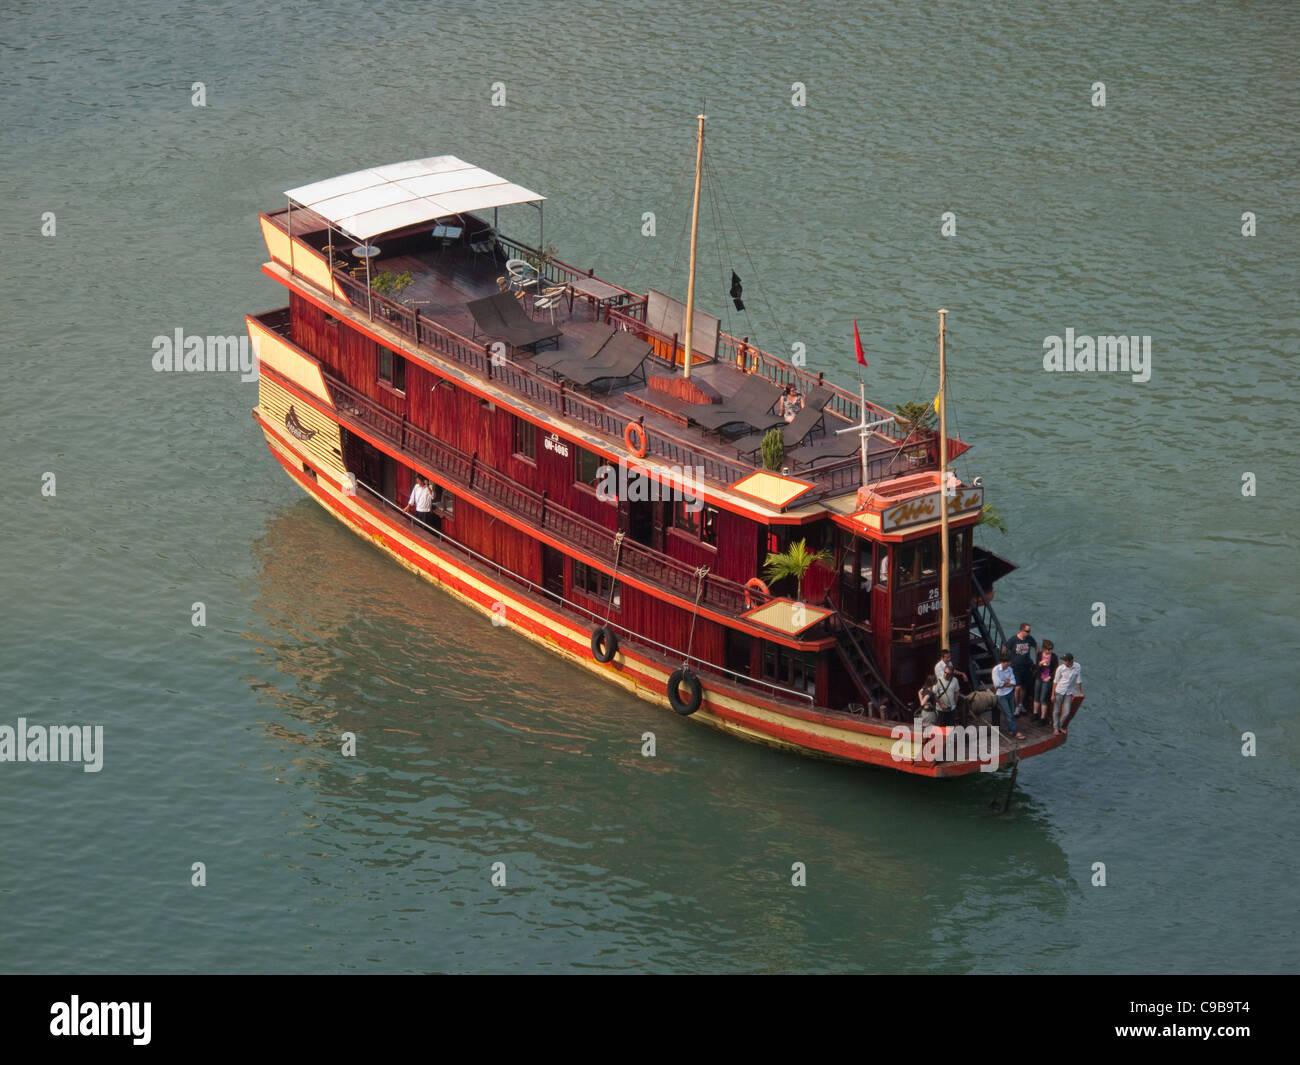 Tourist Junk Boat at Halong Bay in the South China Sea, Vietnam - Stock Image